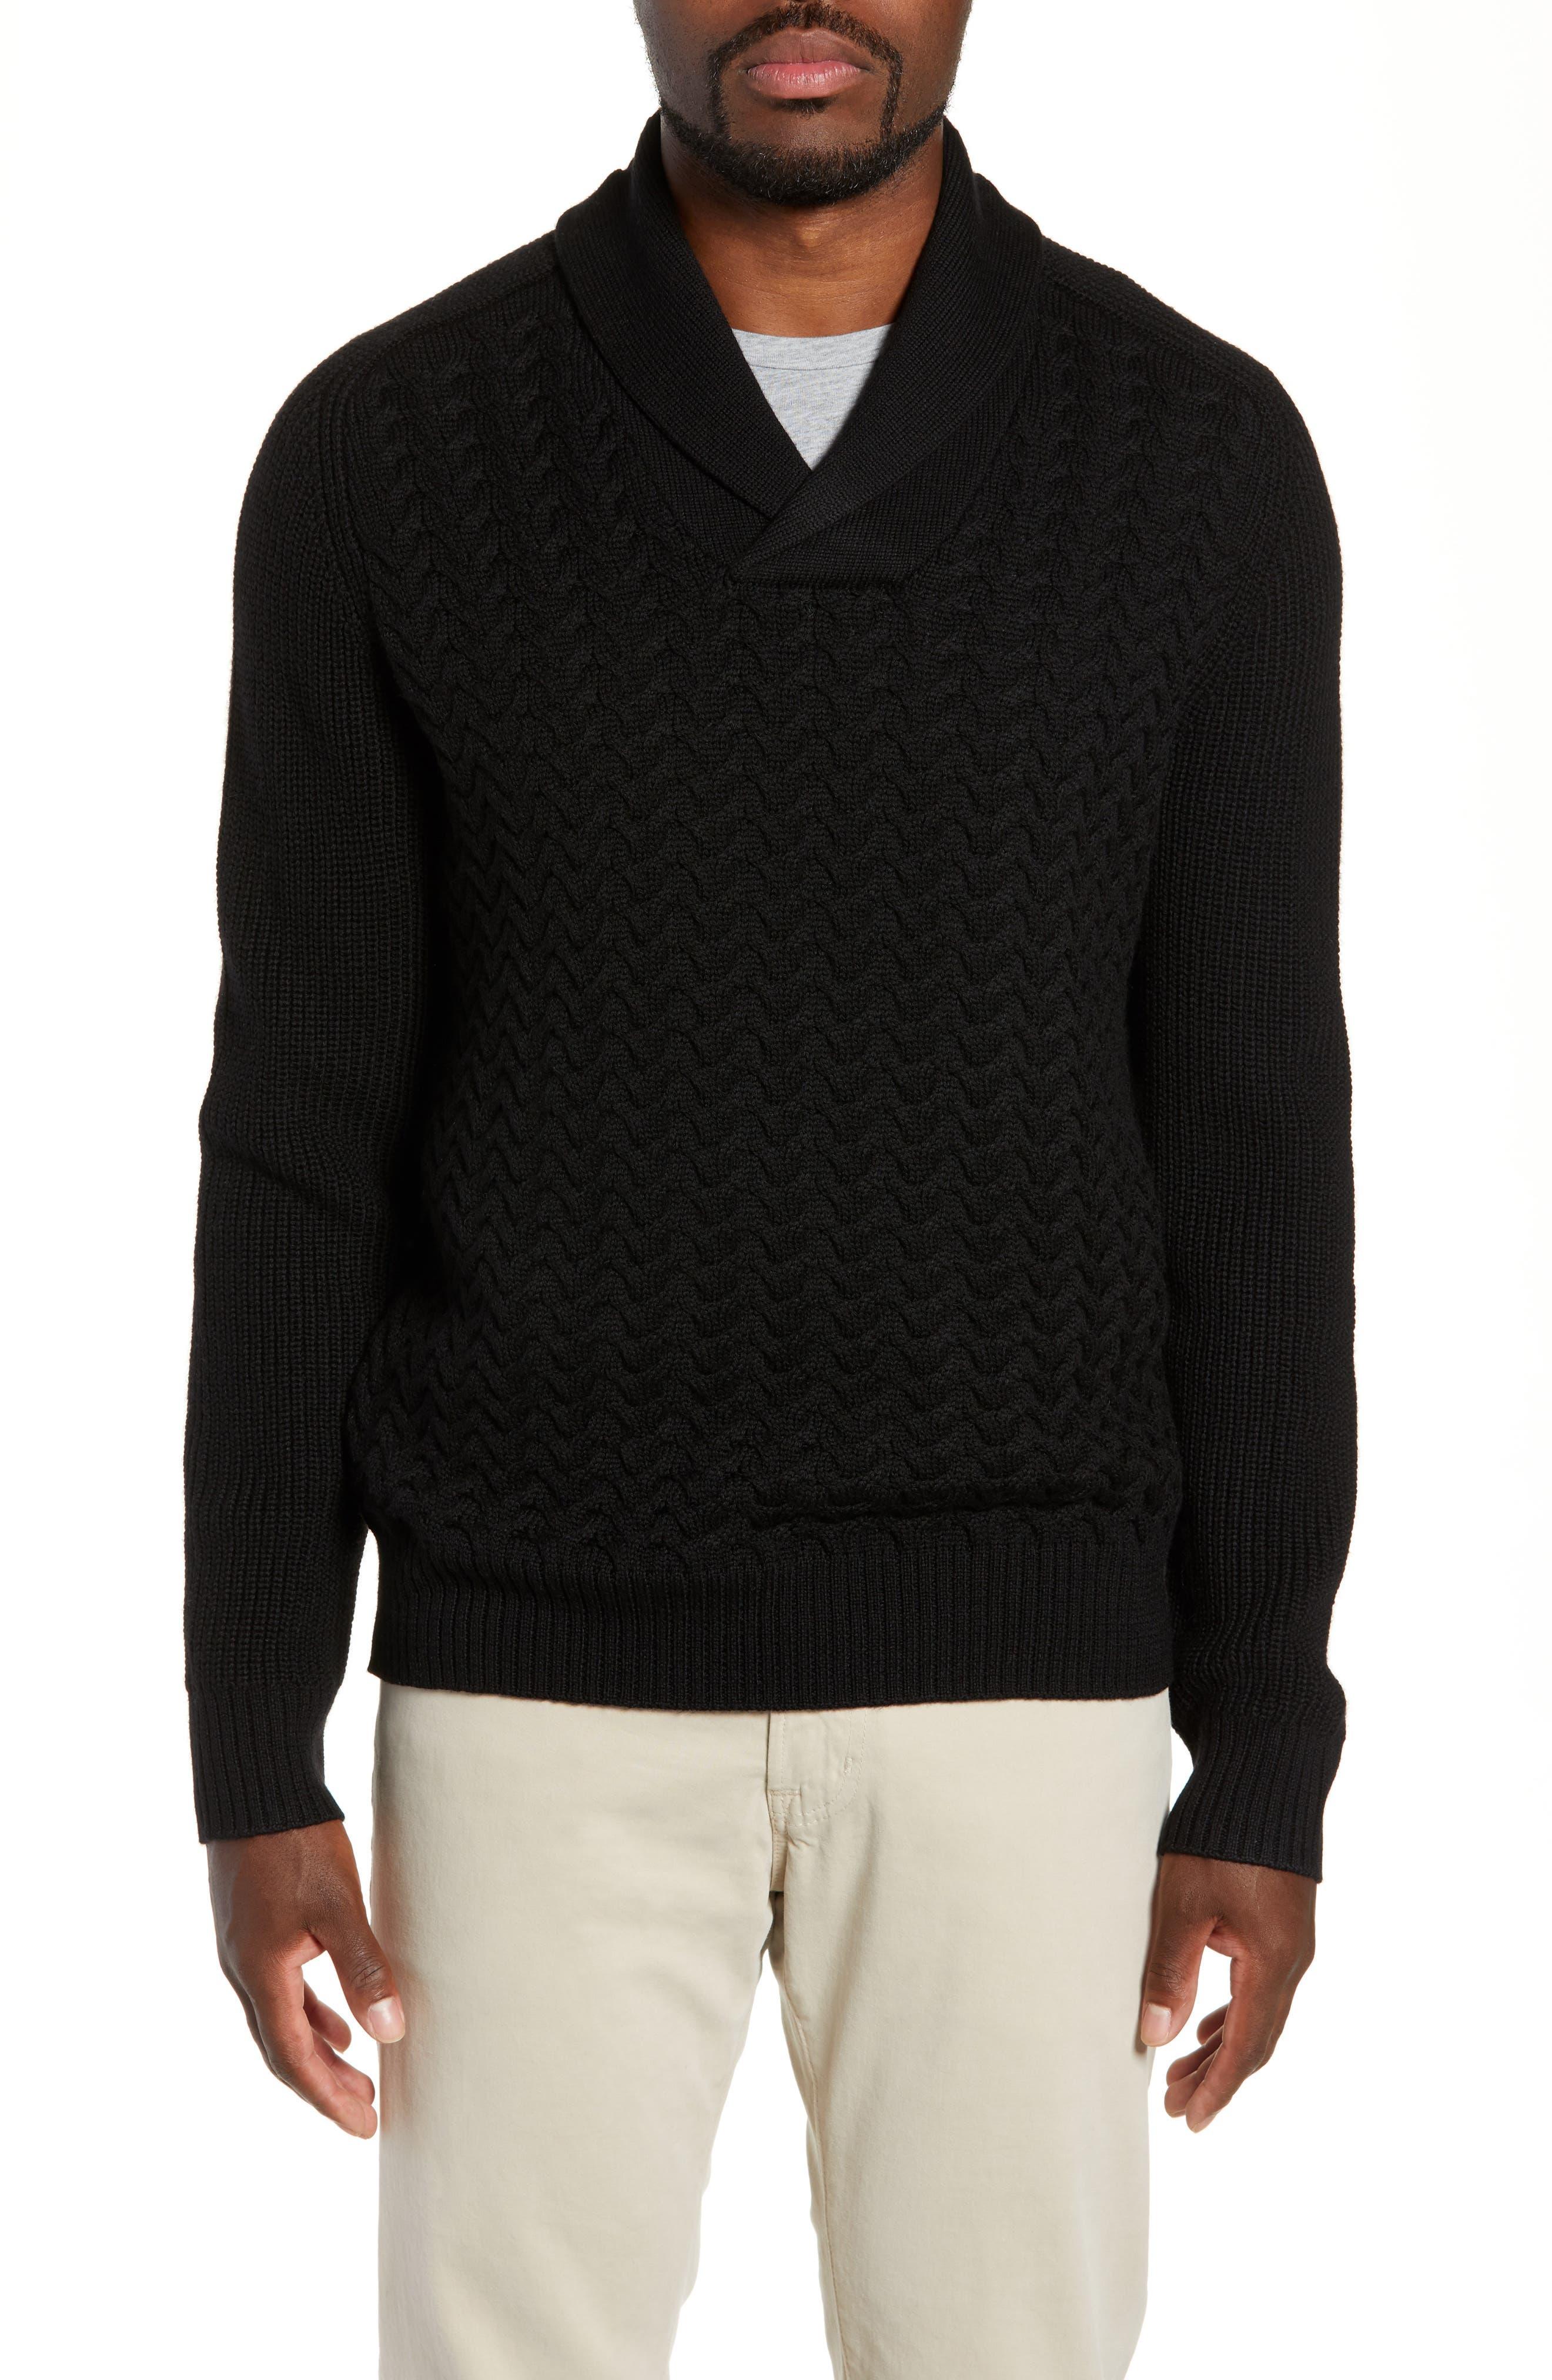 Nordstrom Signature Merino Wool Shawl Collar Sweater, Black